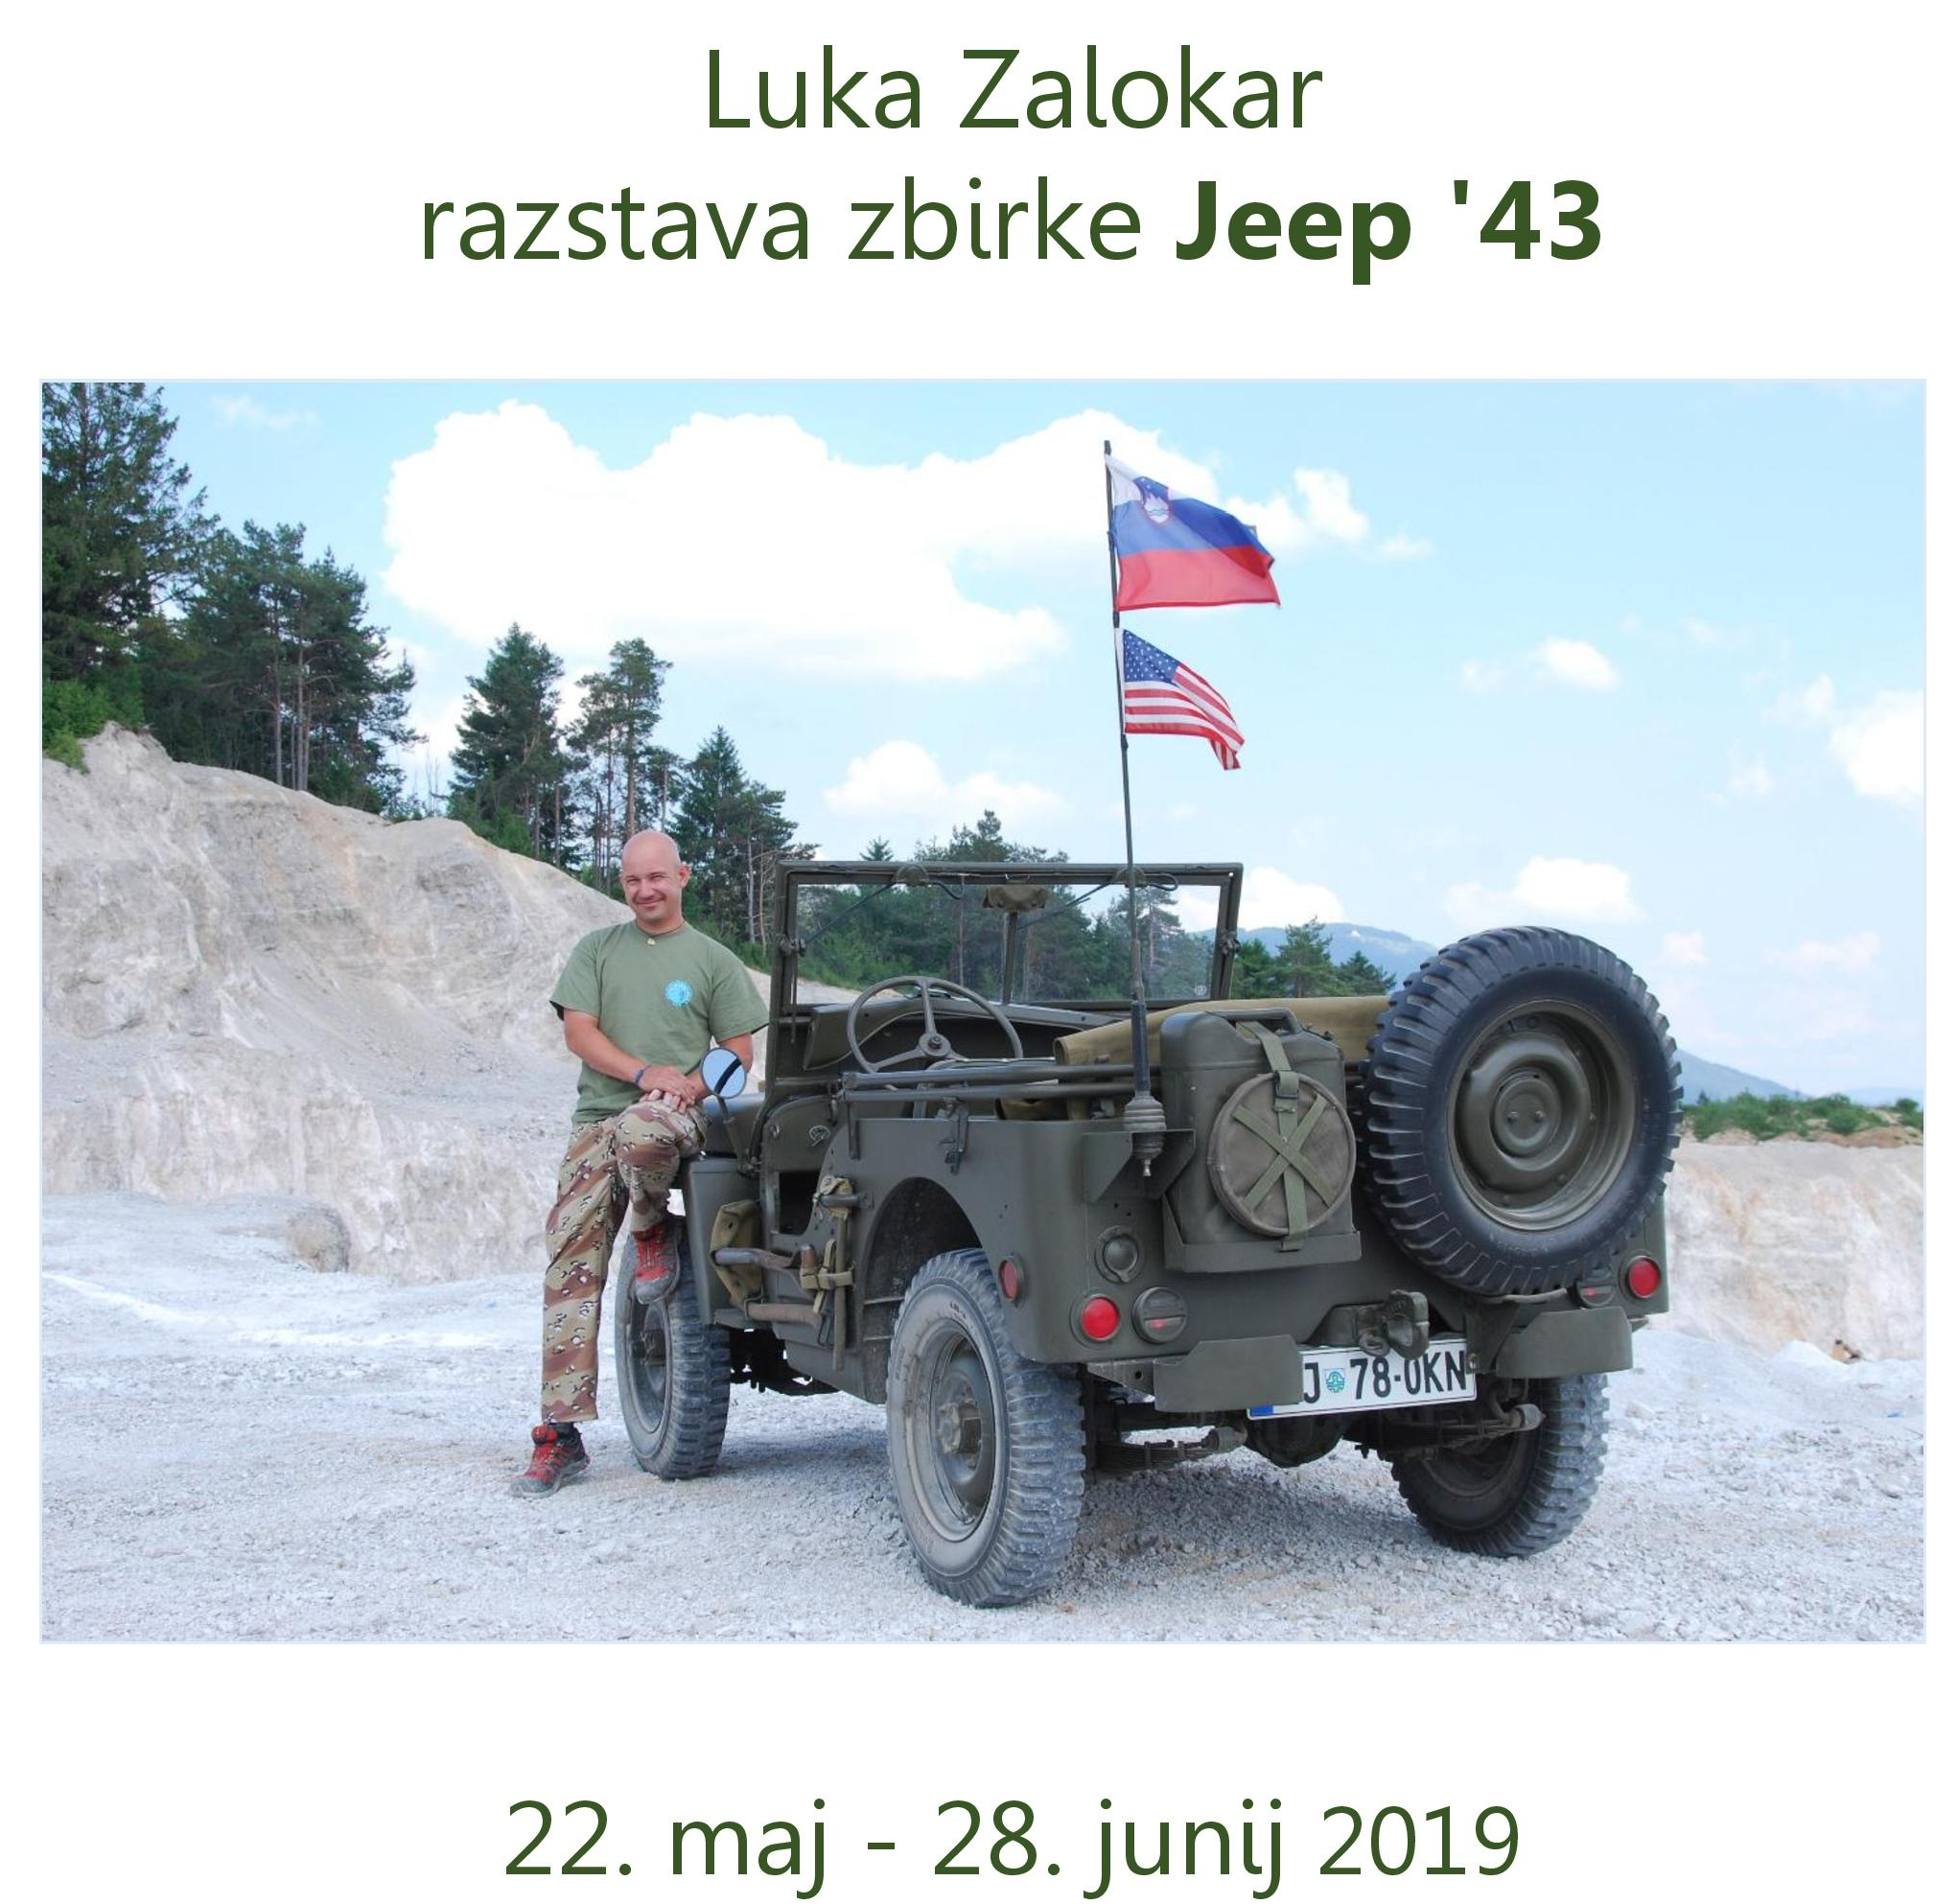 cover 5 - Luka Zalokar - razstava zbirke Jeep '43